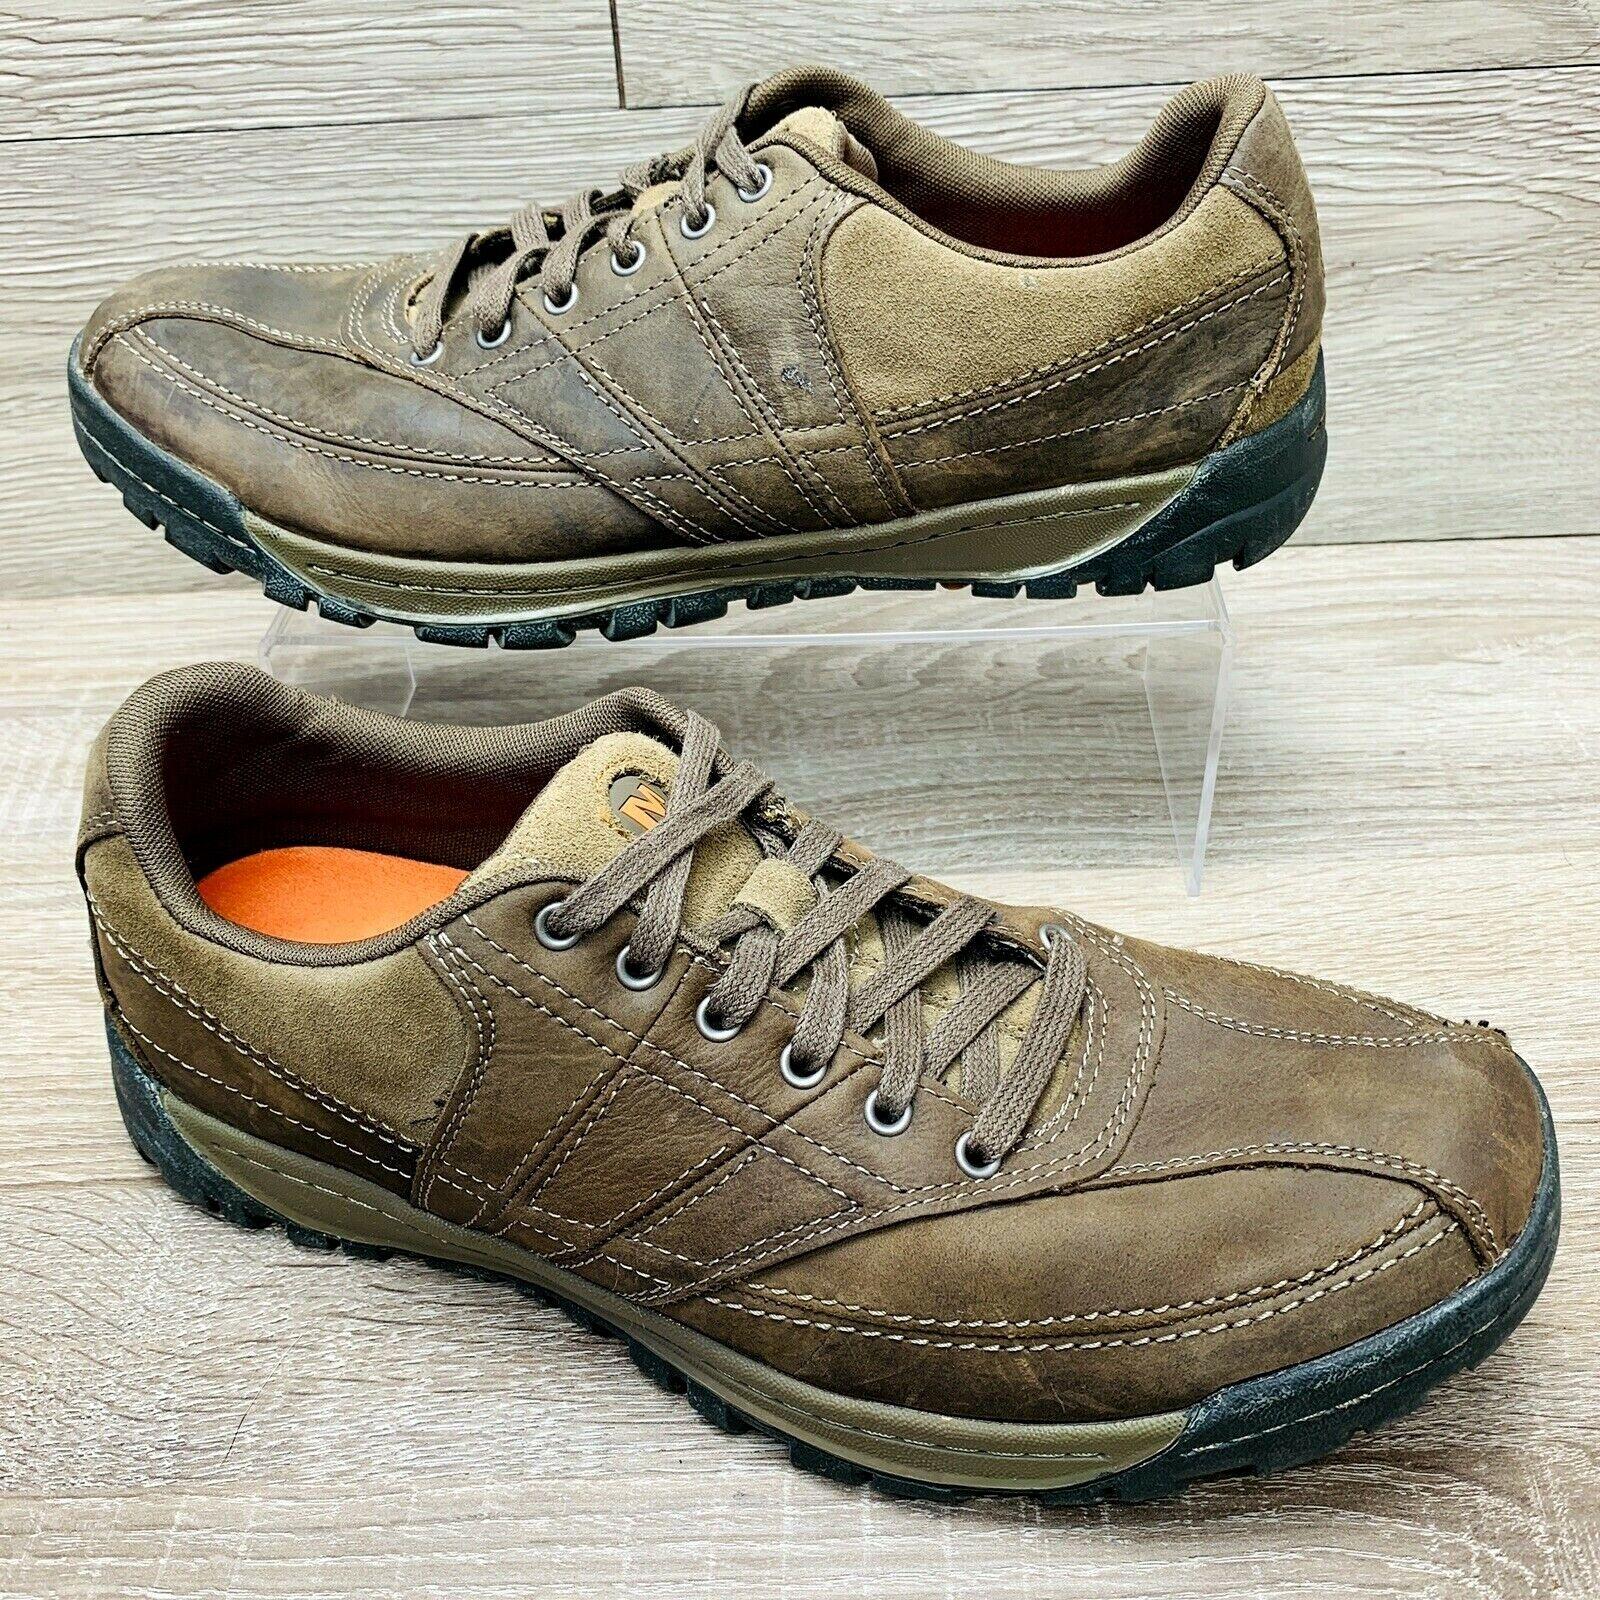 Merrell Canteen Men's Brown Nubuck Leather Casual Walking Shoes J42099 Sz 11.5 M